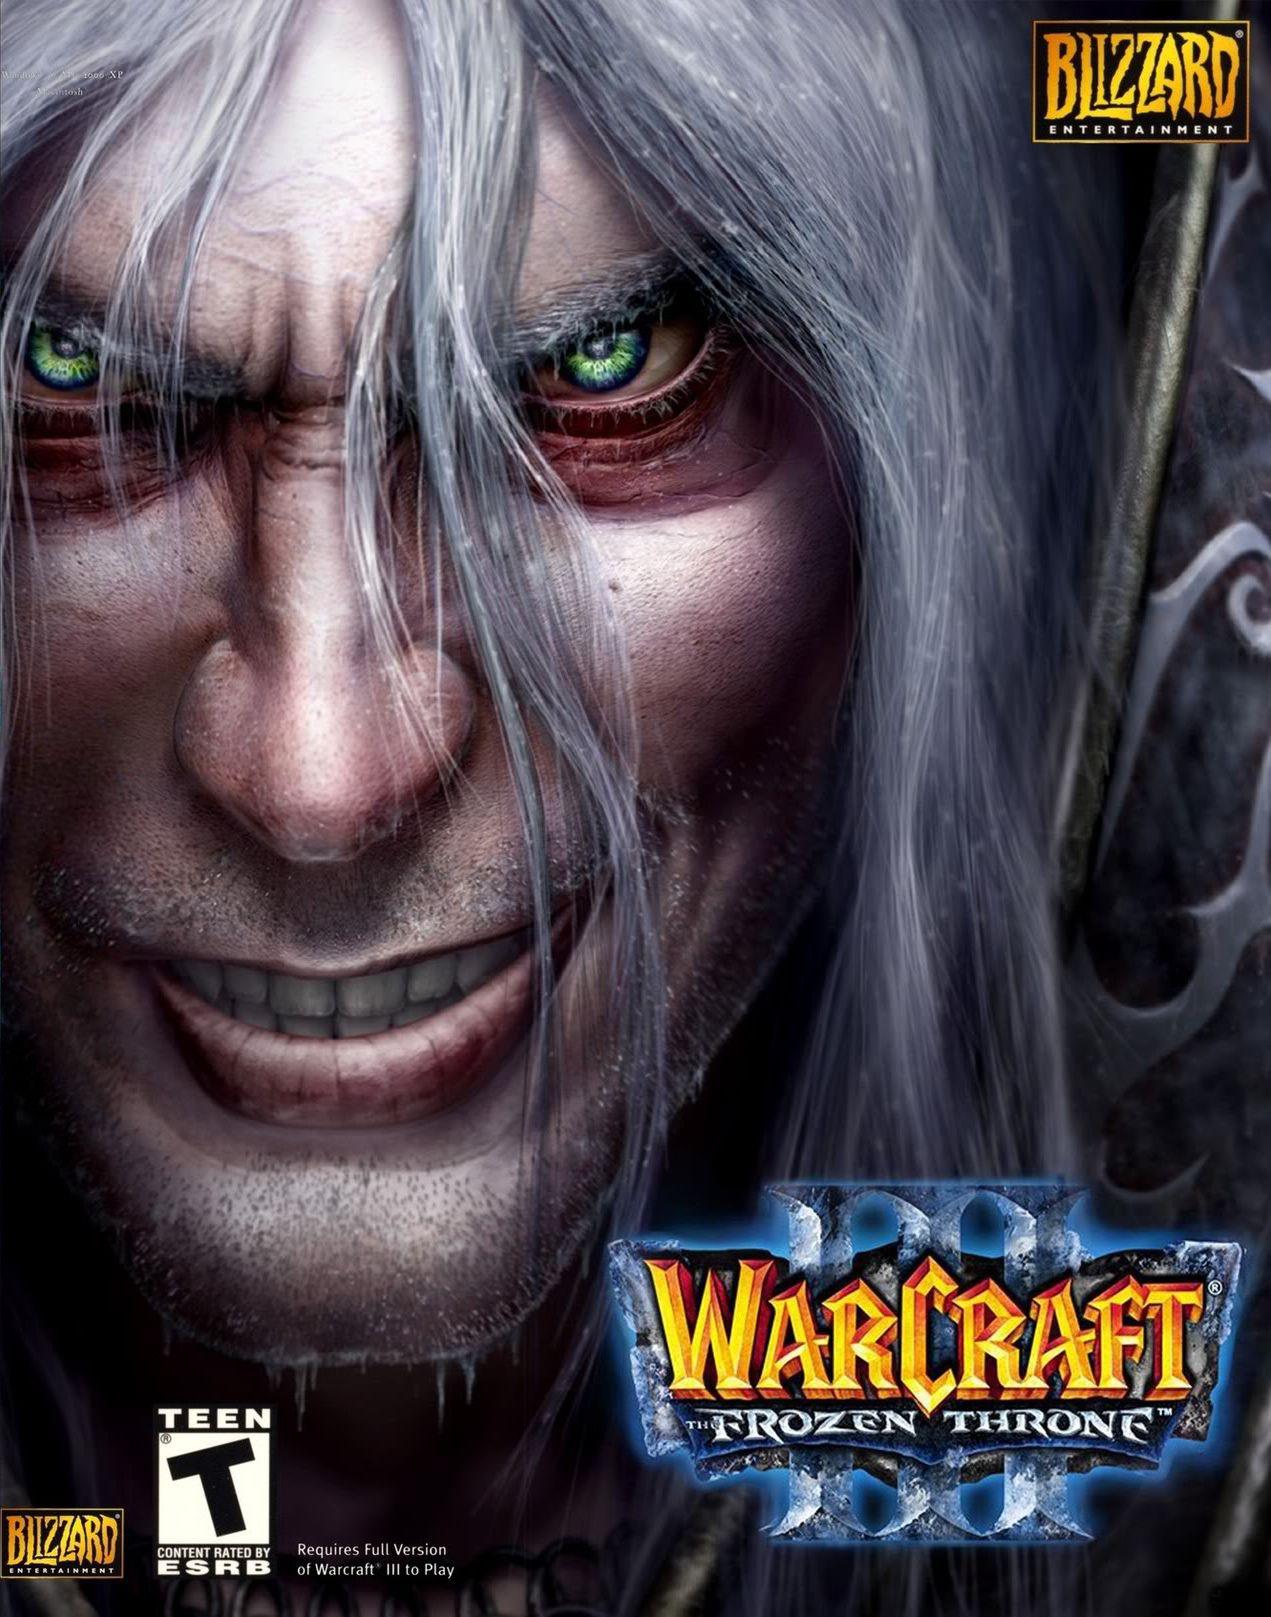 Frozen Throne Dota Warcraft Juegos Pc Juegos